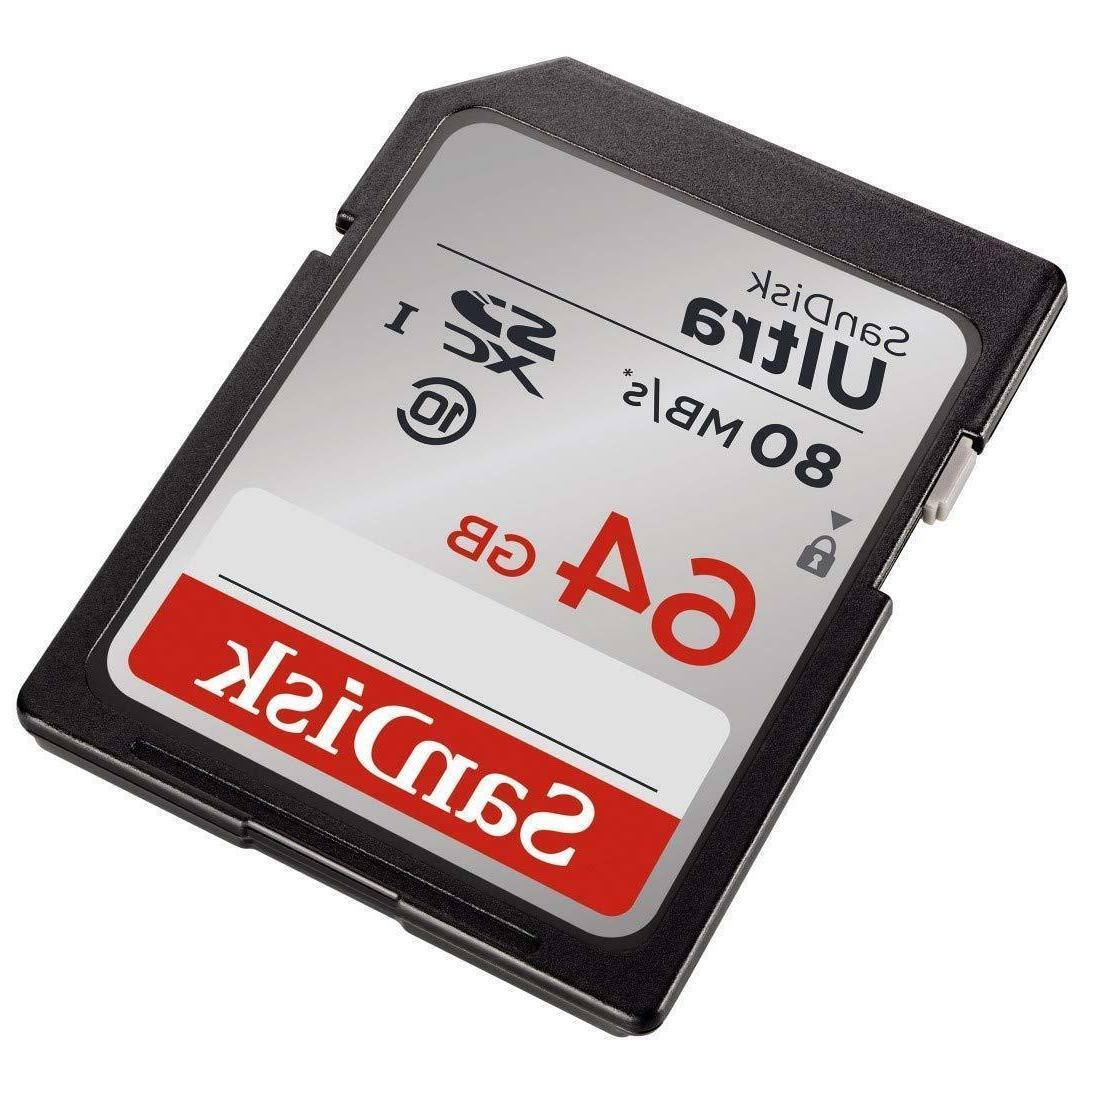 SD Storage Memory Card Ultra UHS-I For Nikon Camera